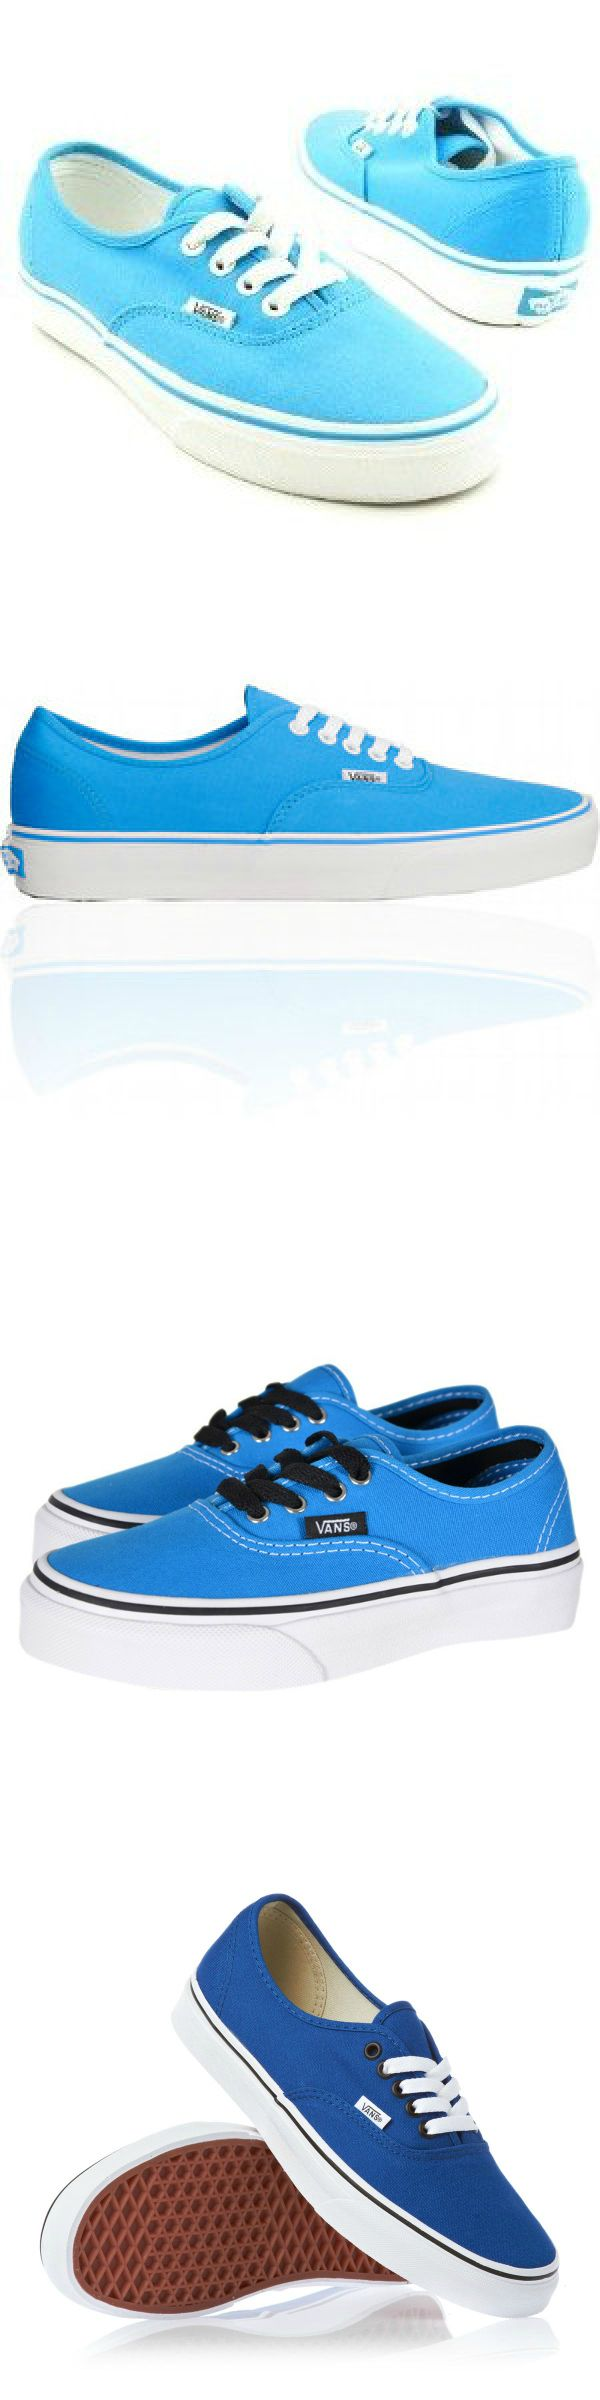 Traditional Van Blue Shoe